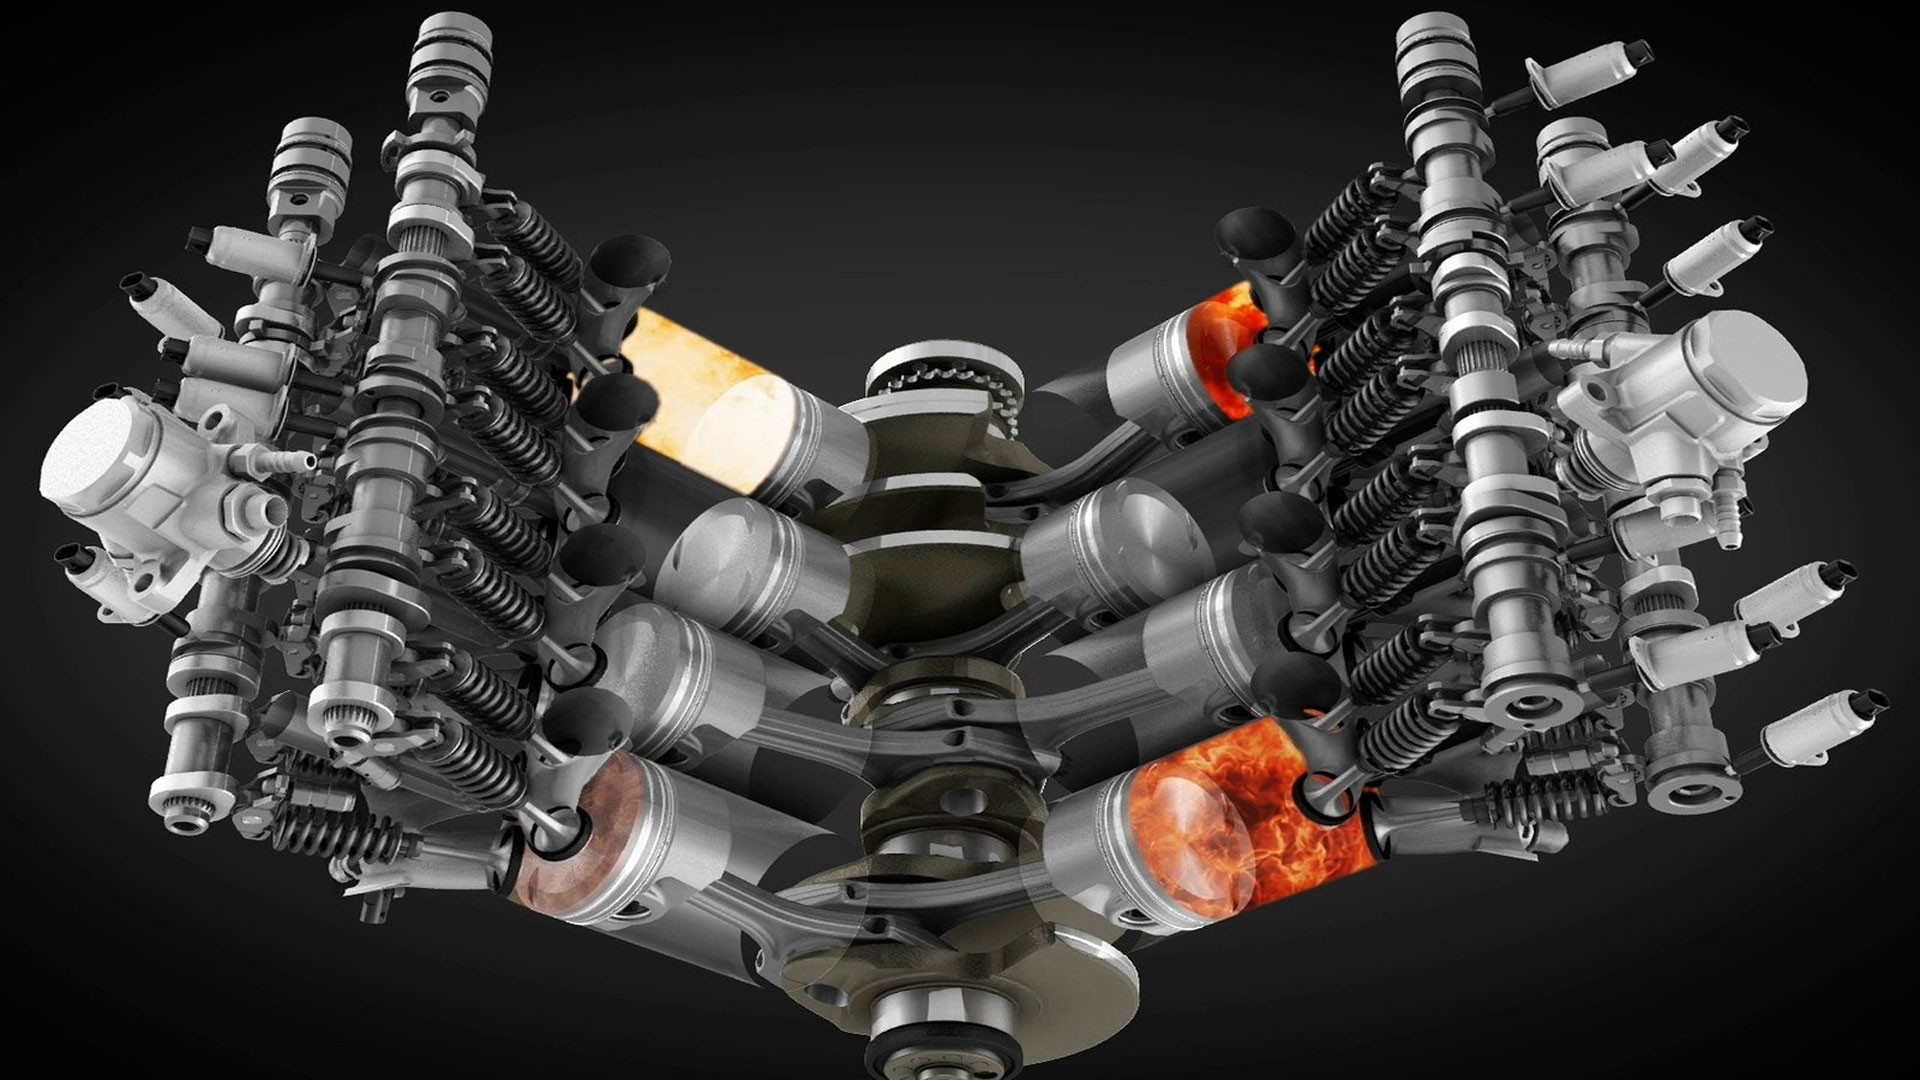 Engines wallpapers wallpapertag - Porsche engine wallpaper ...